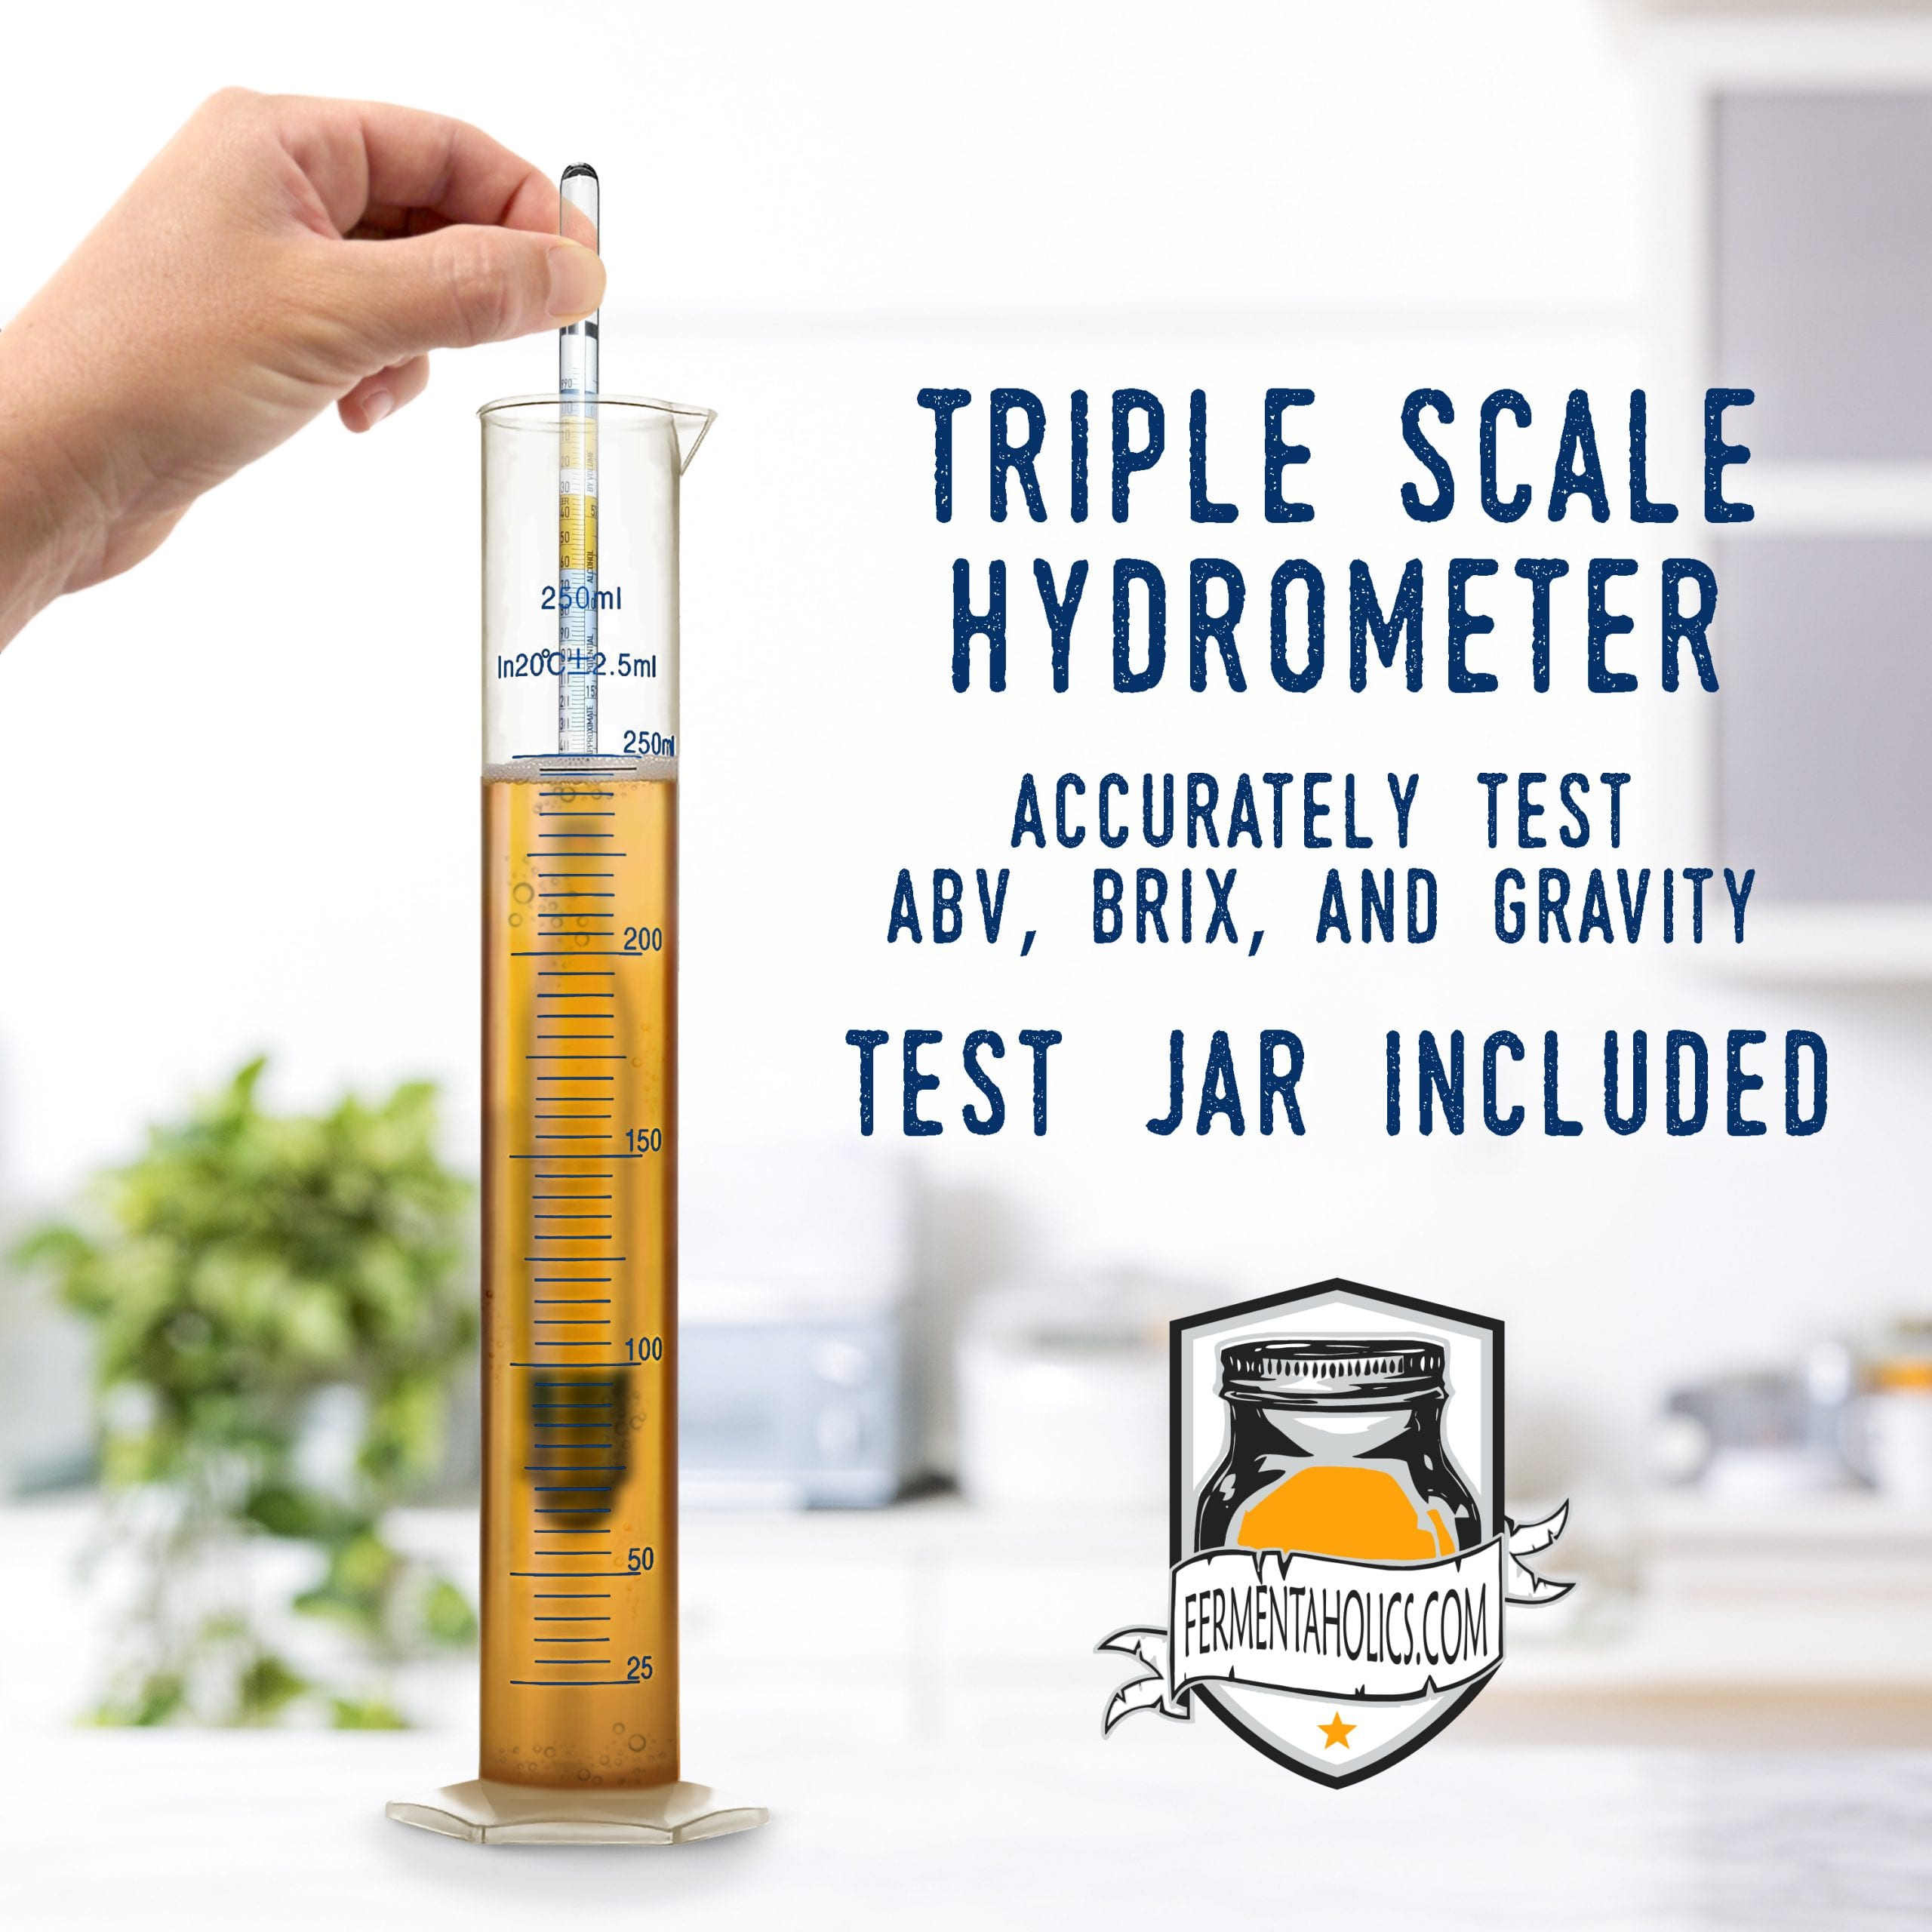 Hydrometer_image